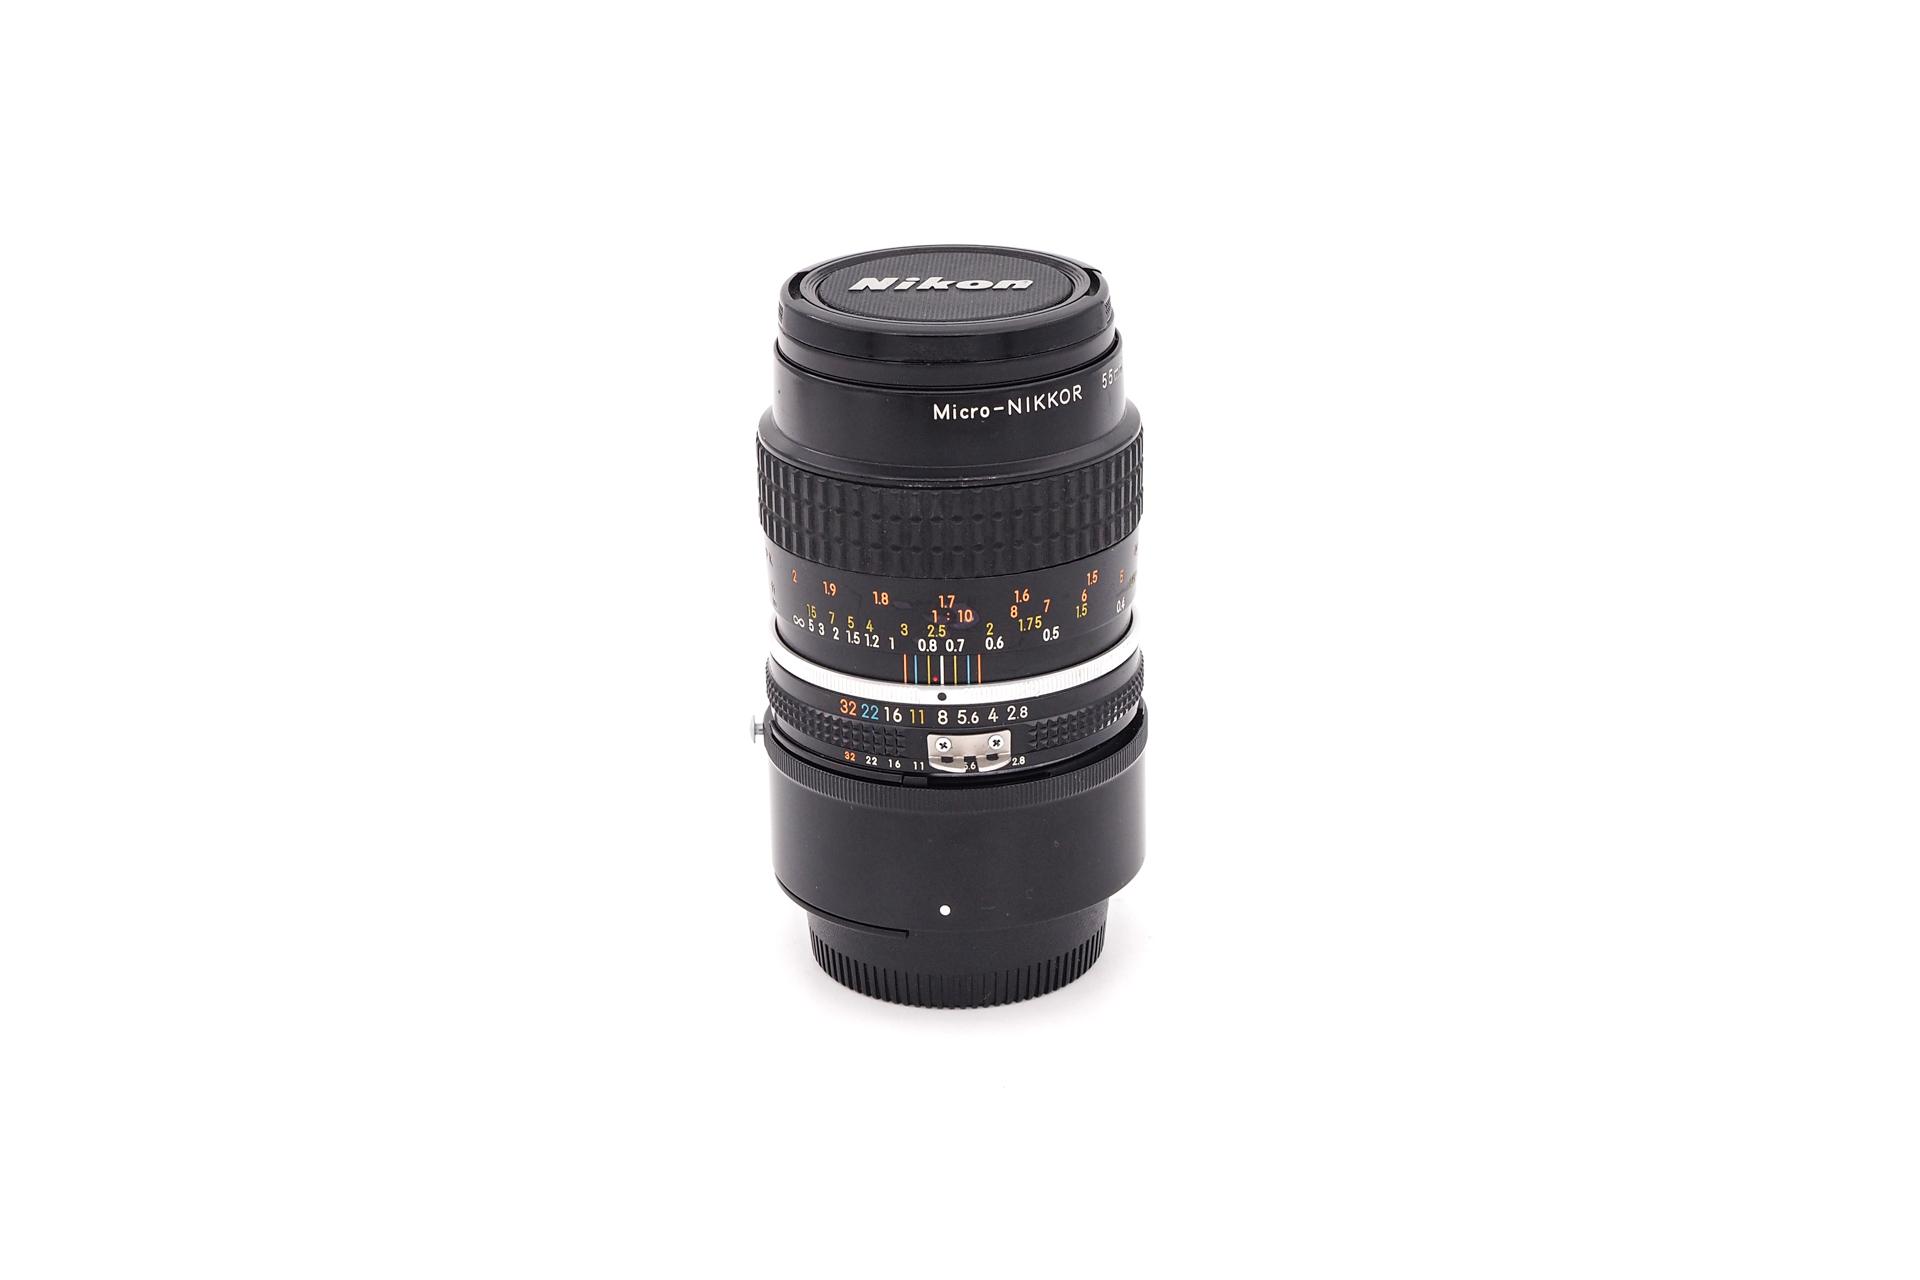 Nikon AI-S 55mm F/2.8 Micro-Nikkor